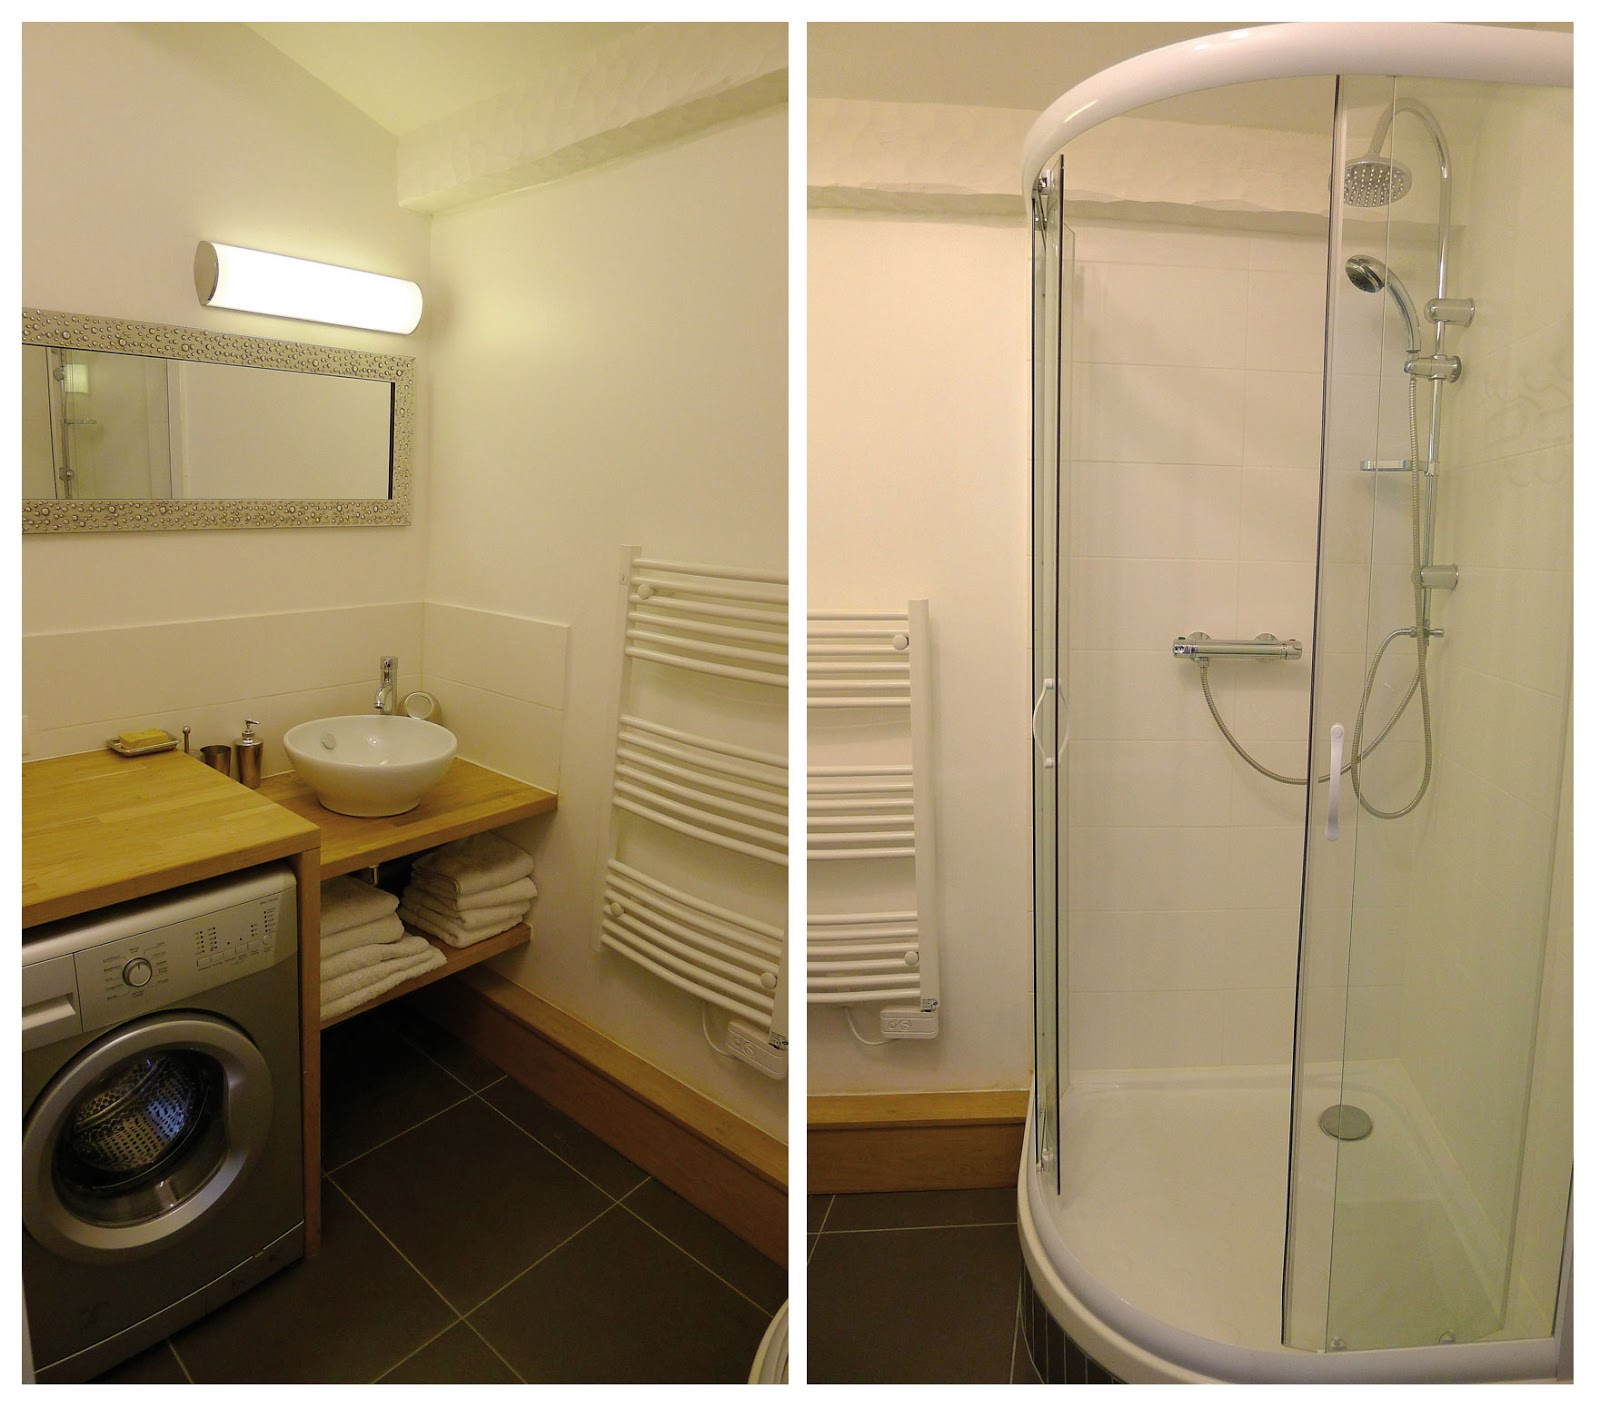 Modele salle de bain avec machine a laver salle de bains - Lave linge dans salle de bain ...